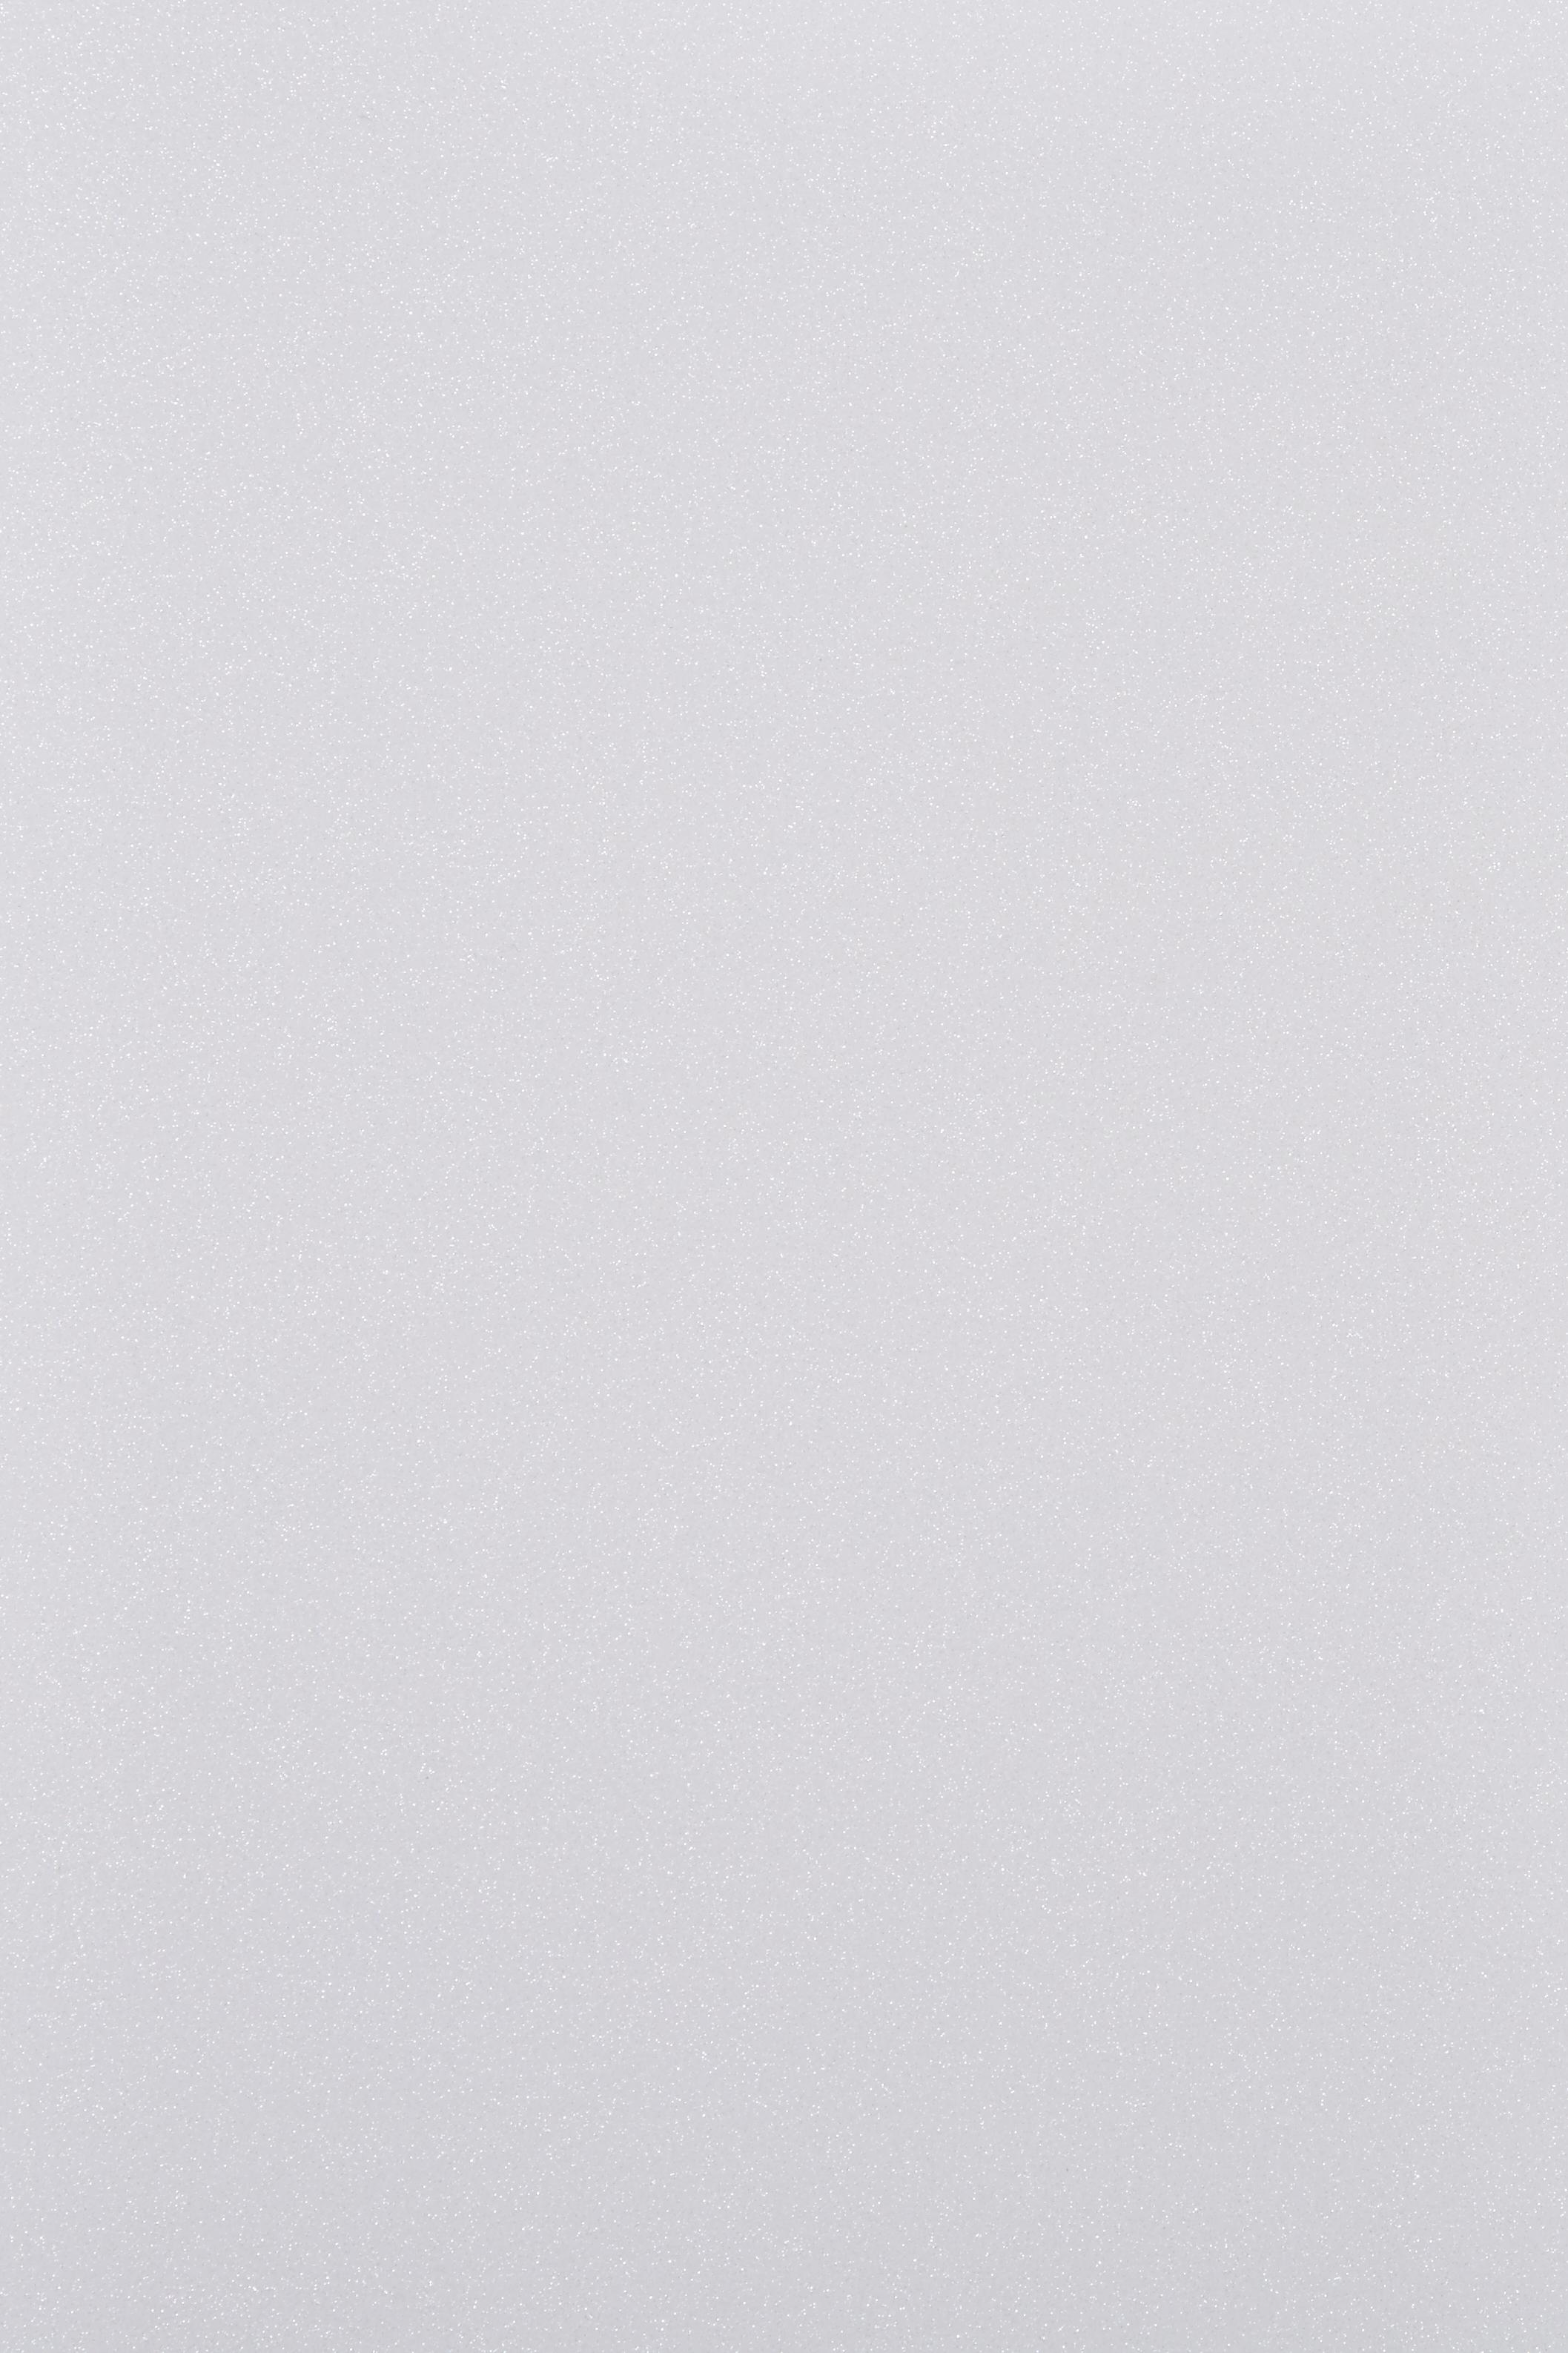 BGS 3401 XG - Snow Shimmer High Pressure Laminate (HPL)